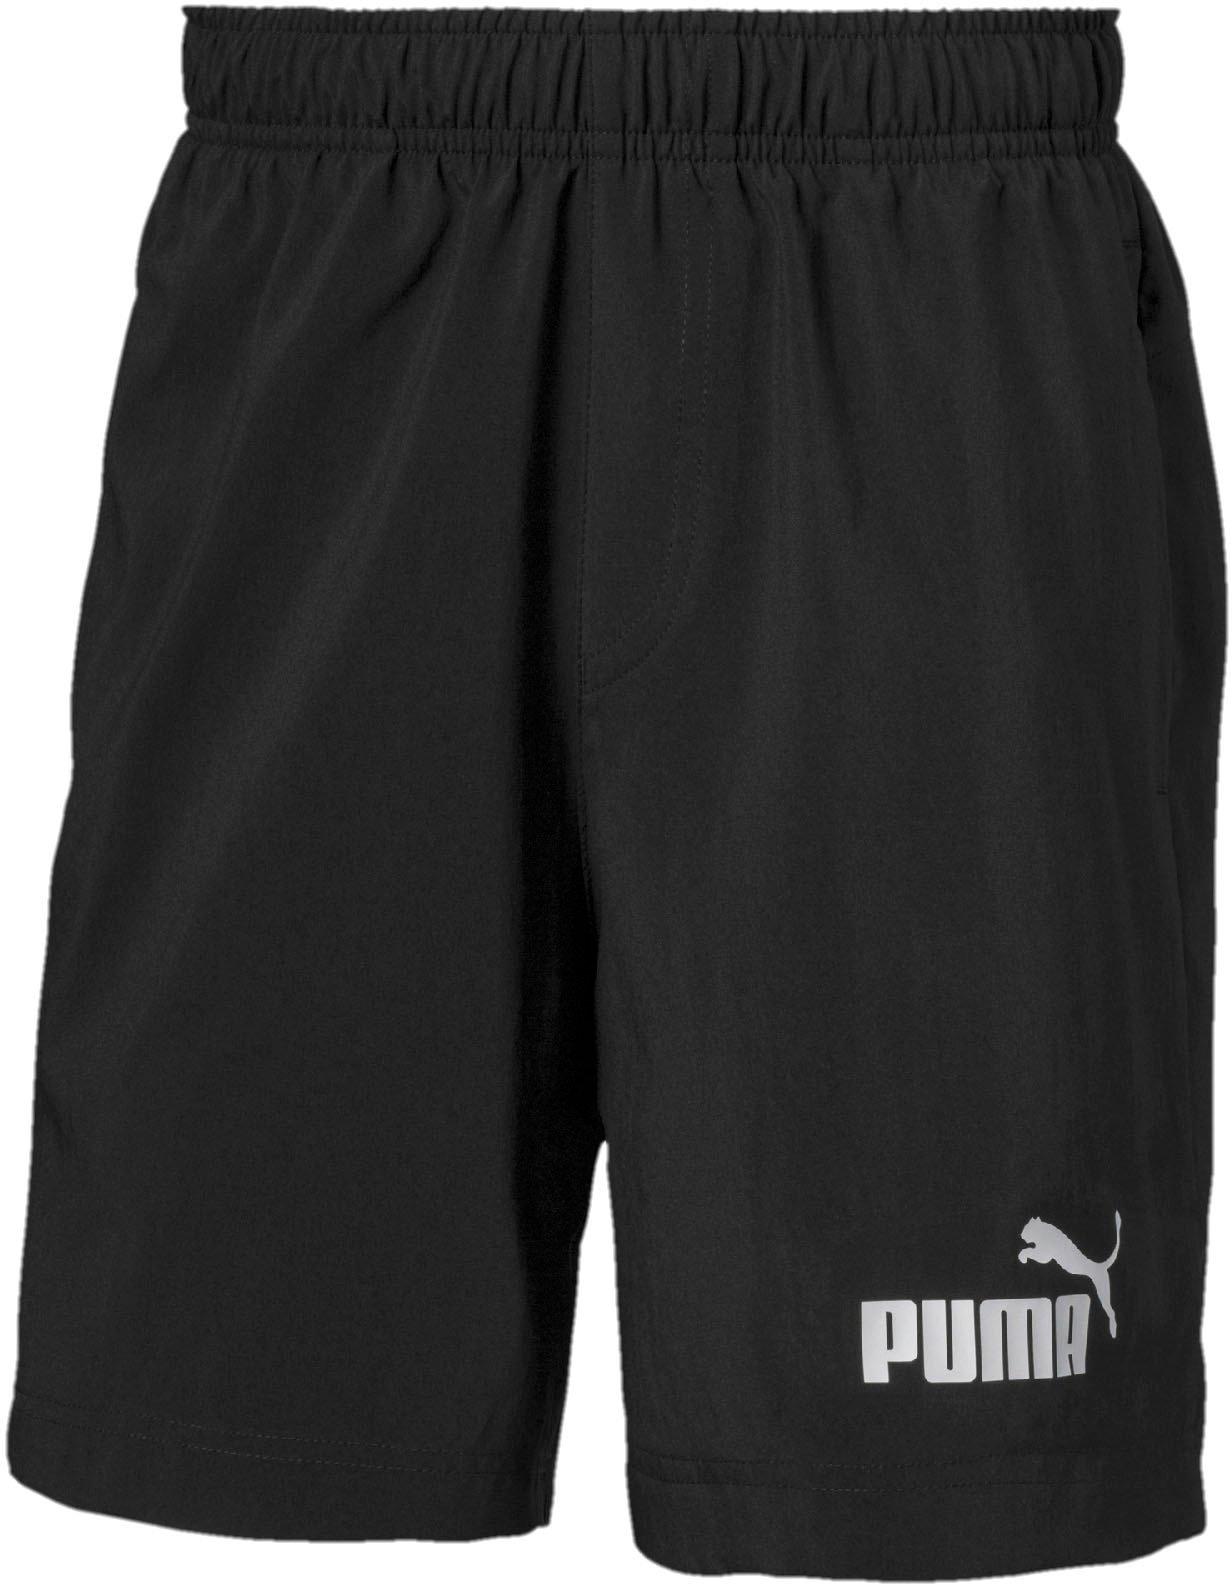 PUMA short ESS Woven Shorts 5